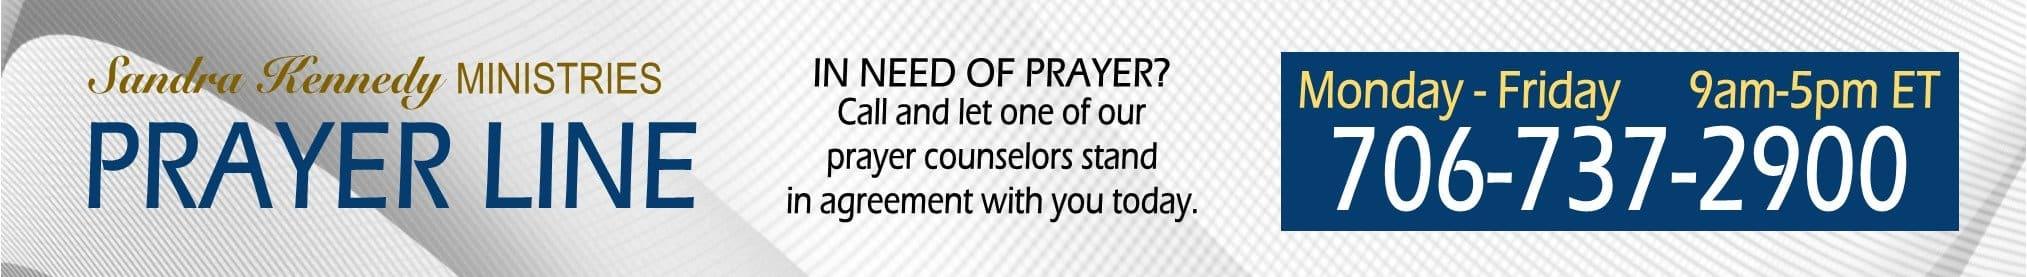 Prayer Line Banner SKM